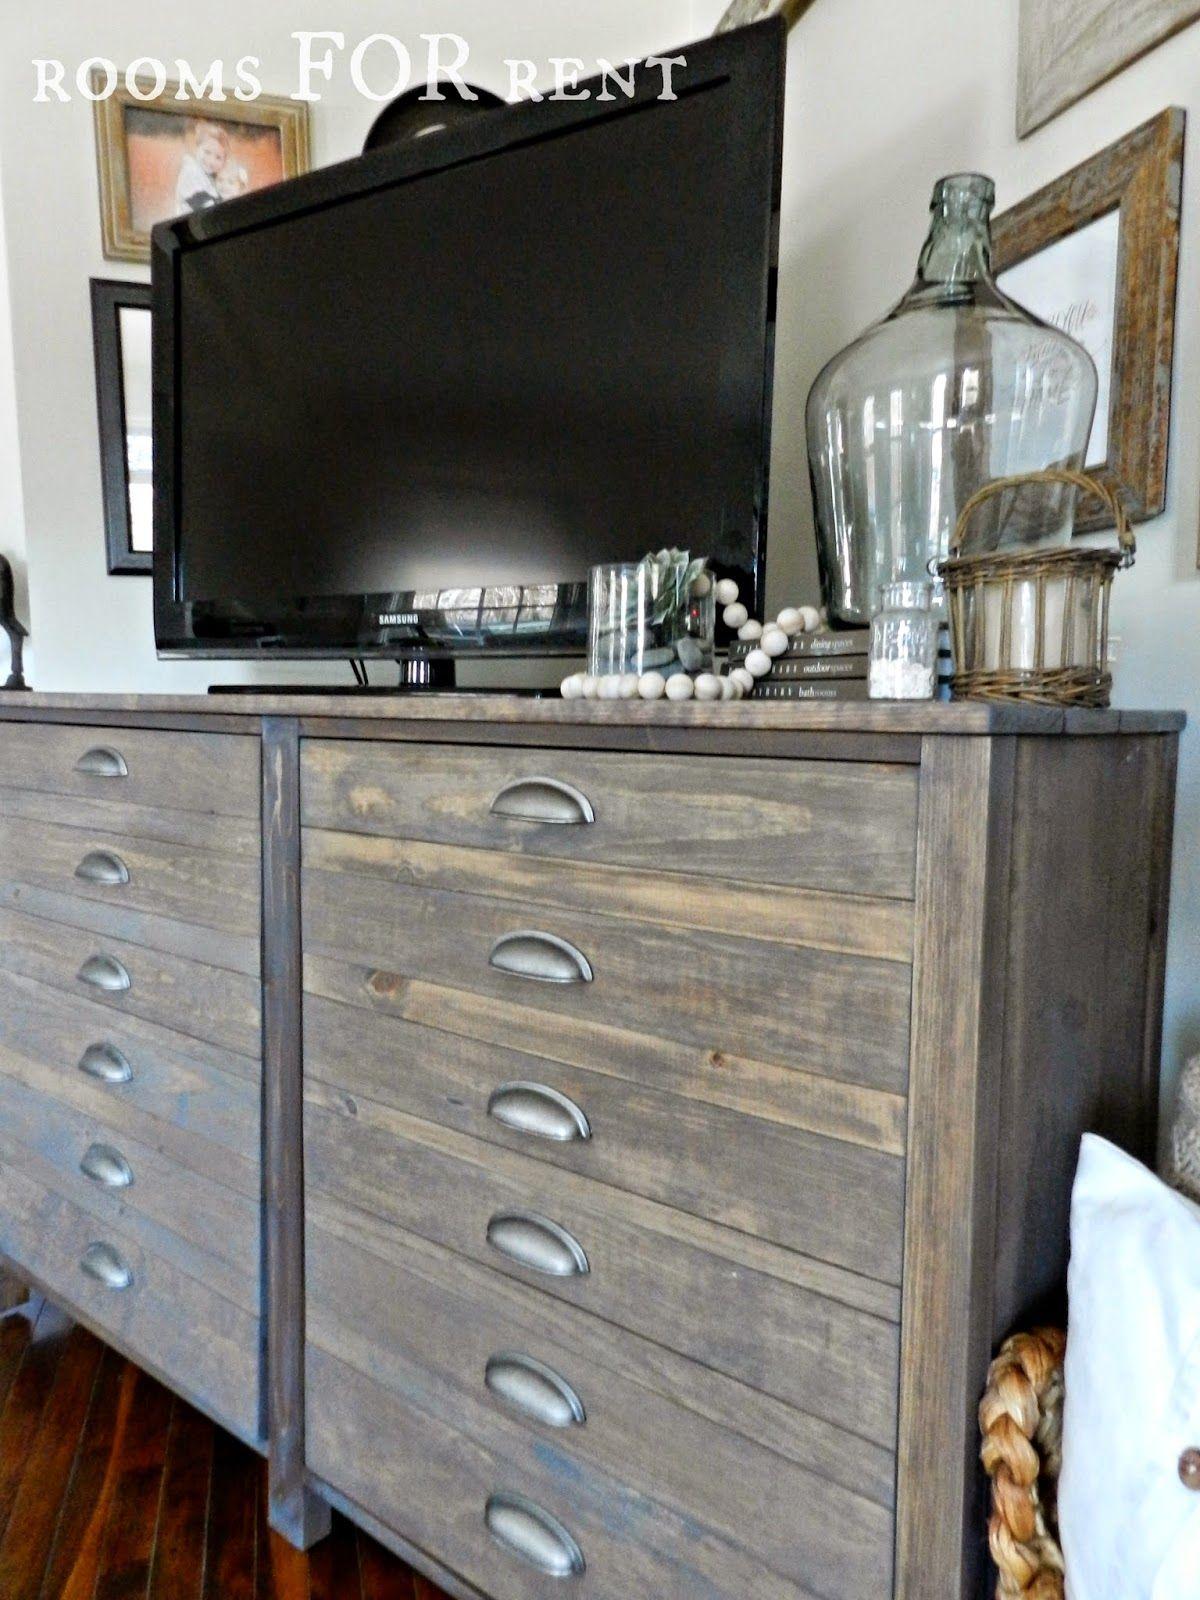 Rooms For Rent New Printer S Cabinet Printer Cabinet Furniture Diy Furniture [ 1600 x 1200 Pixel ]